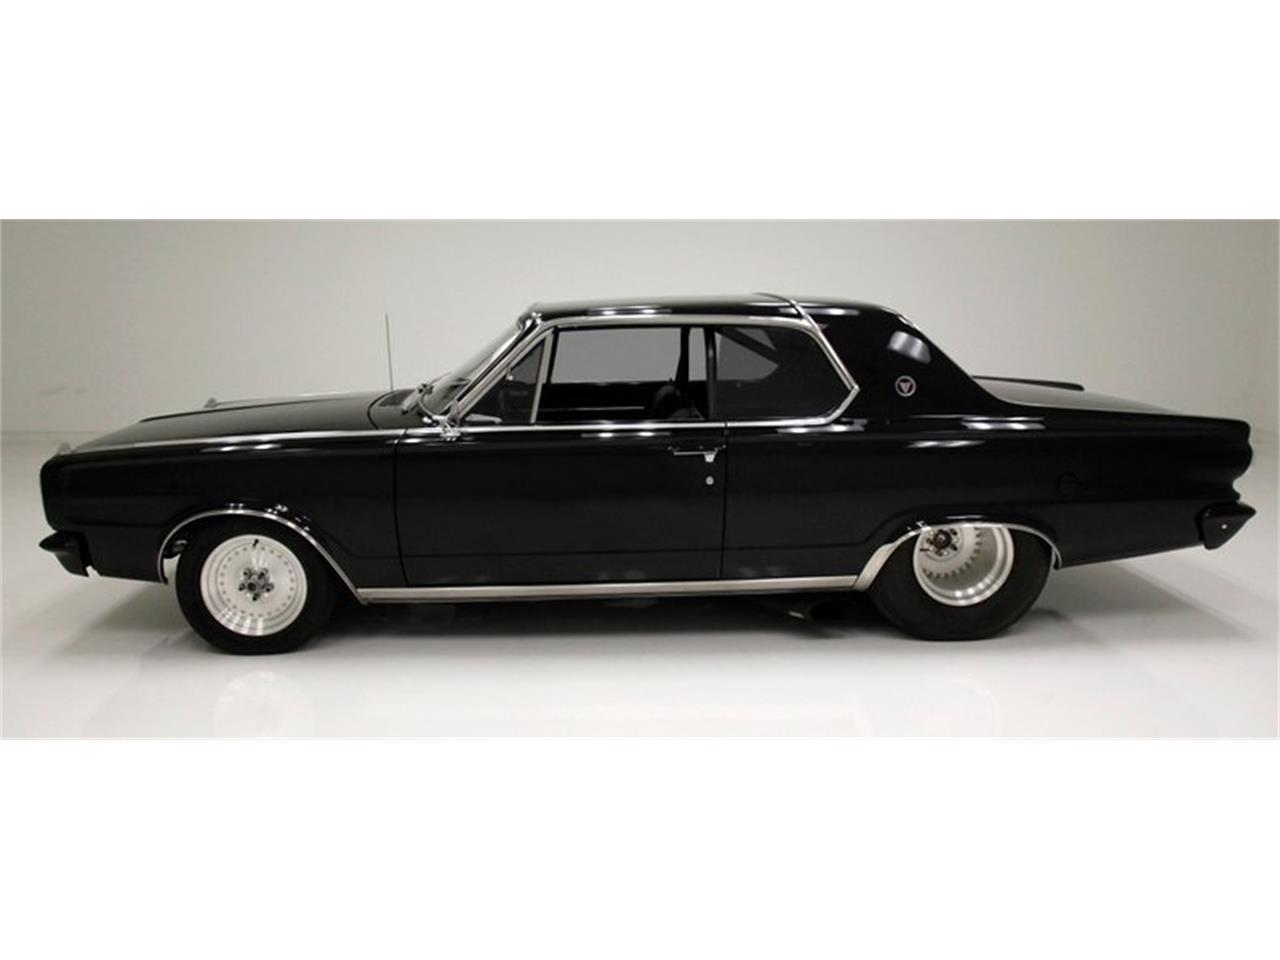 1966 Plymouth Valiant (CC-1363571) for sale in Morgantown, Pennsylvania